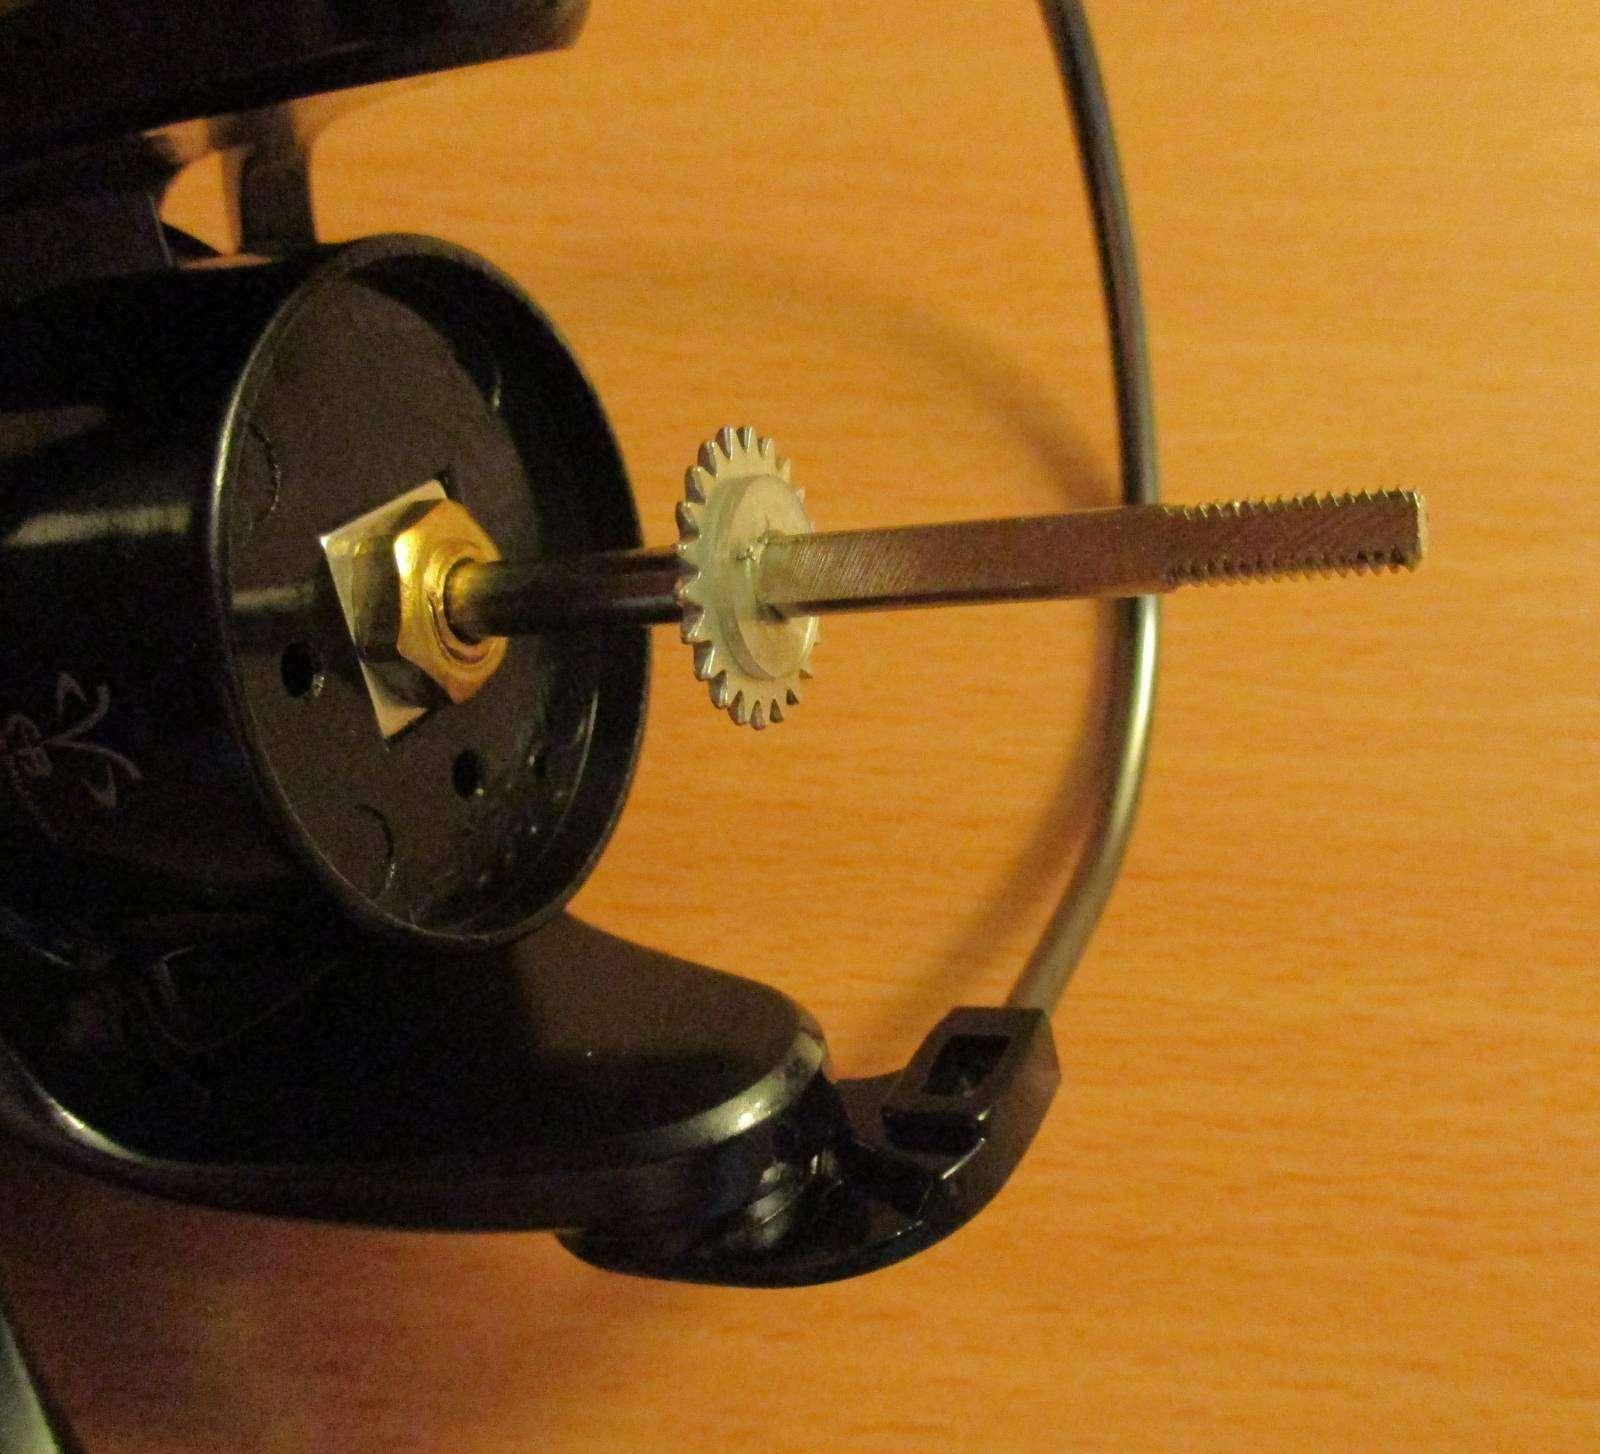 GearBest: Спиннинговая катушка DIAODELAI LK2000+плетенка LineThink Goal 1.0